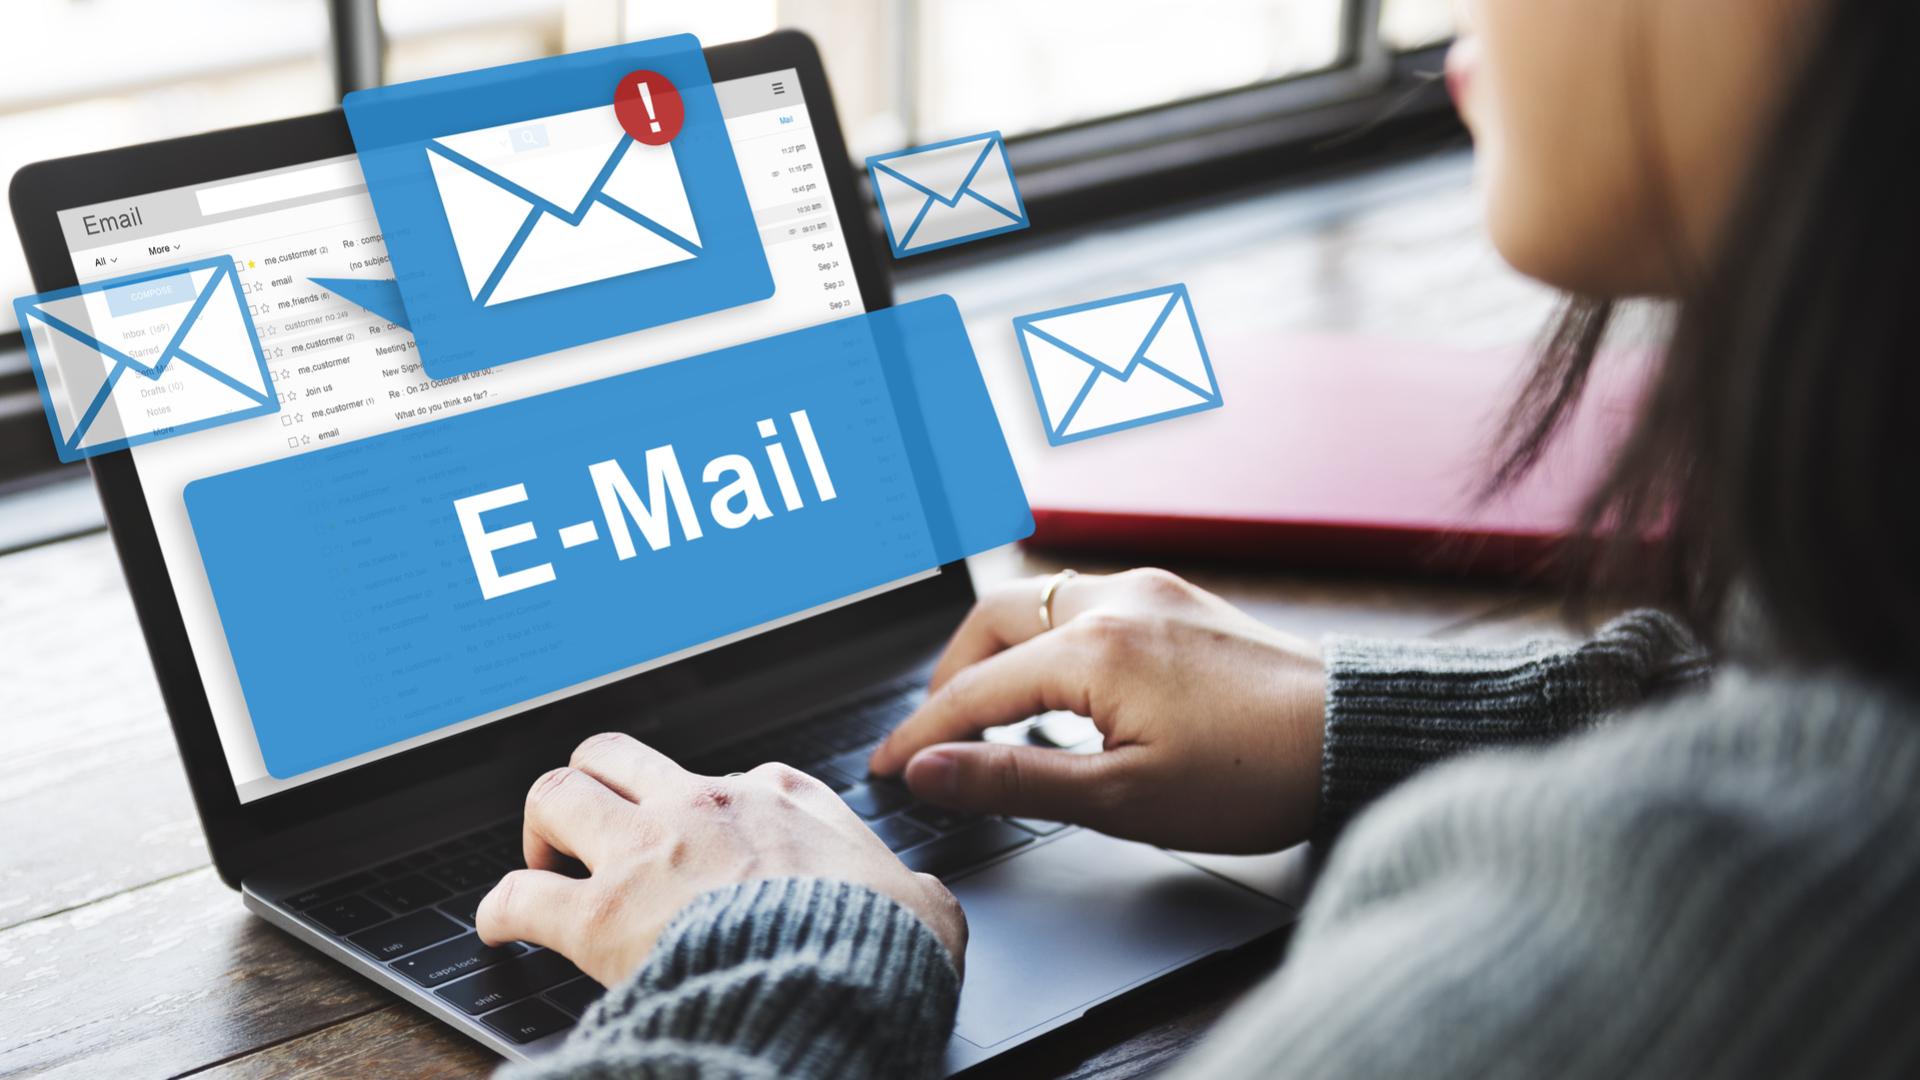 remind究竟要不要加of?統計數百封英文mail中,最常見的6種錯誤英文用法